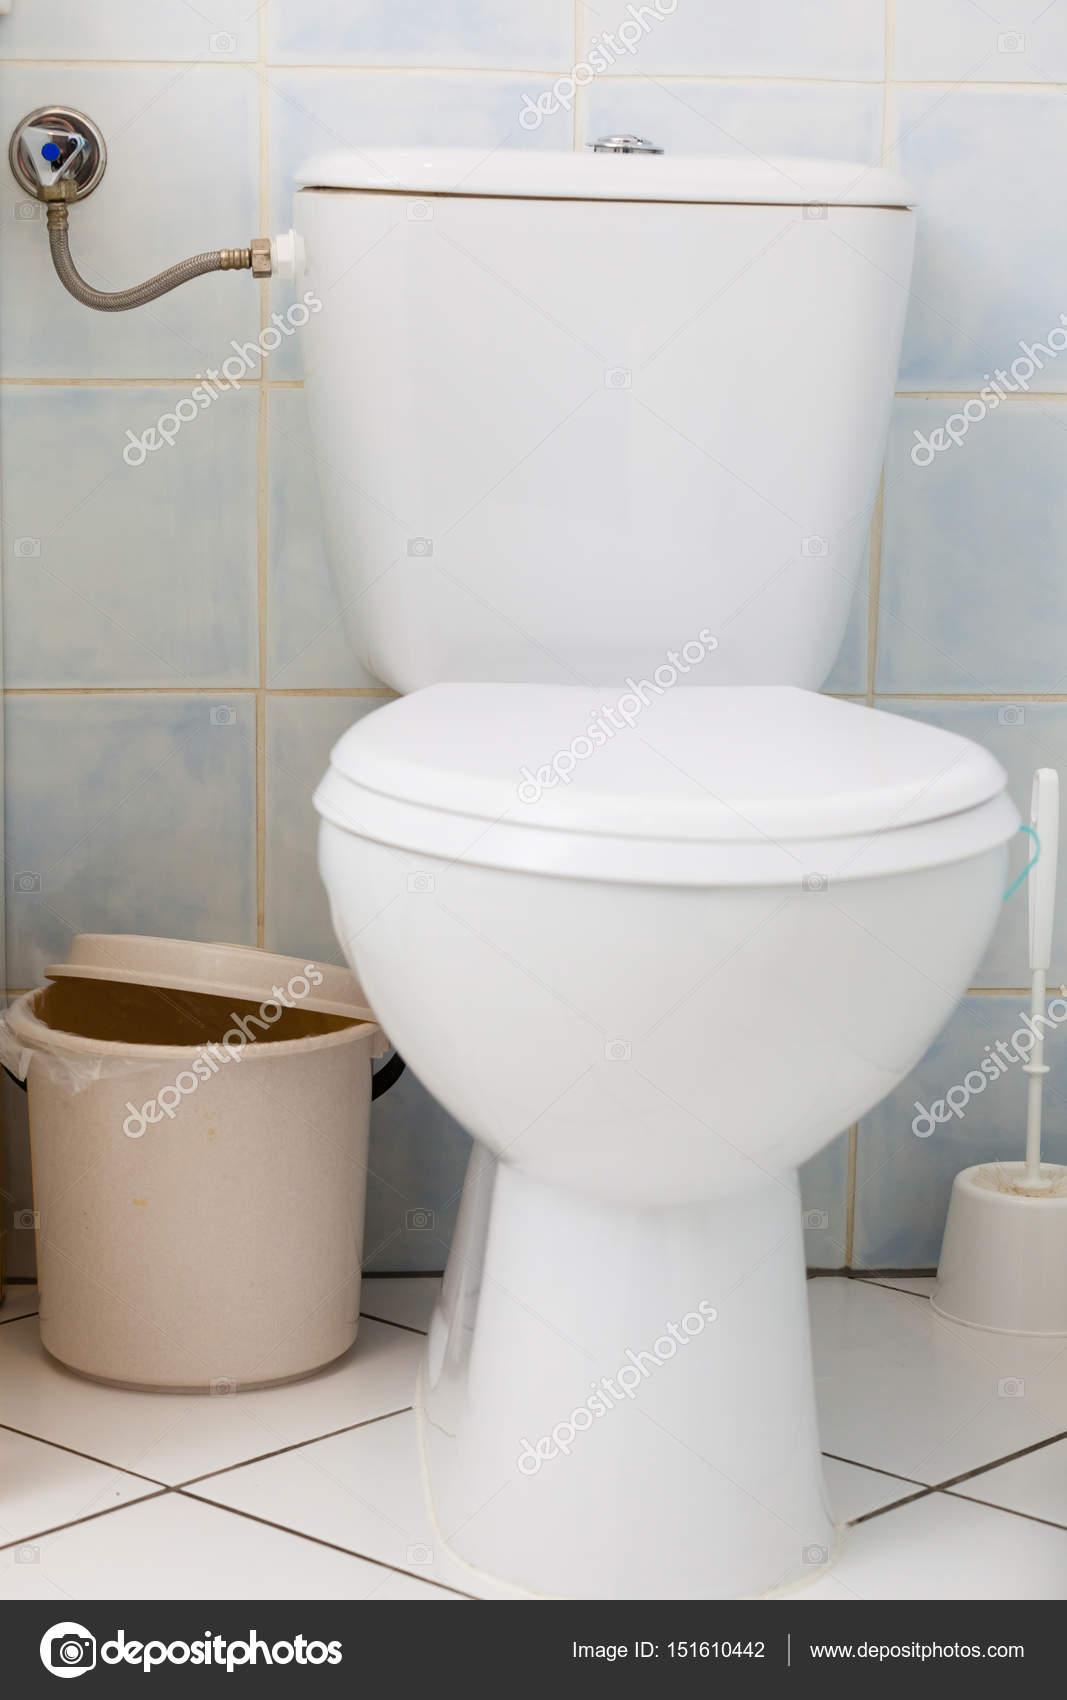 Witte WC in badkamer toilet en de kleine prullenbak kan — Stockfoto ...